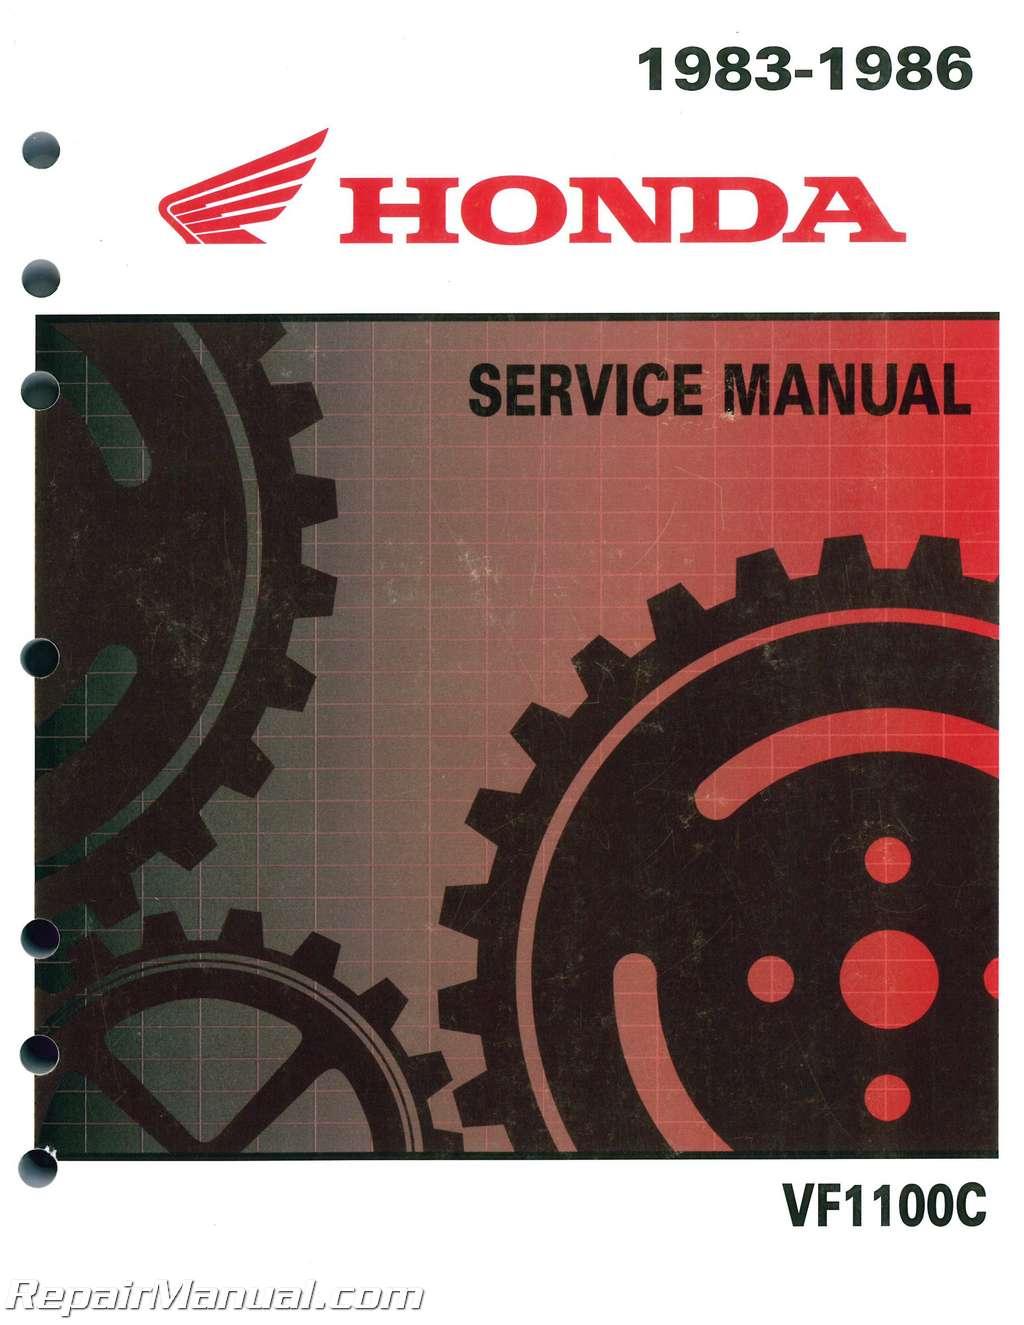 vf1100c magna v65 honda motorcycle service manual 1983 1986 rh repairmanual com